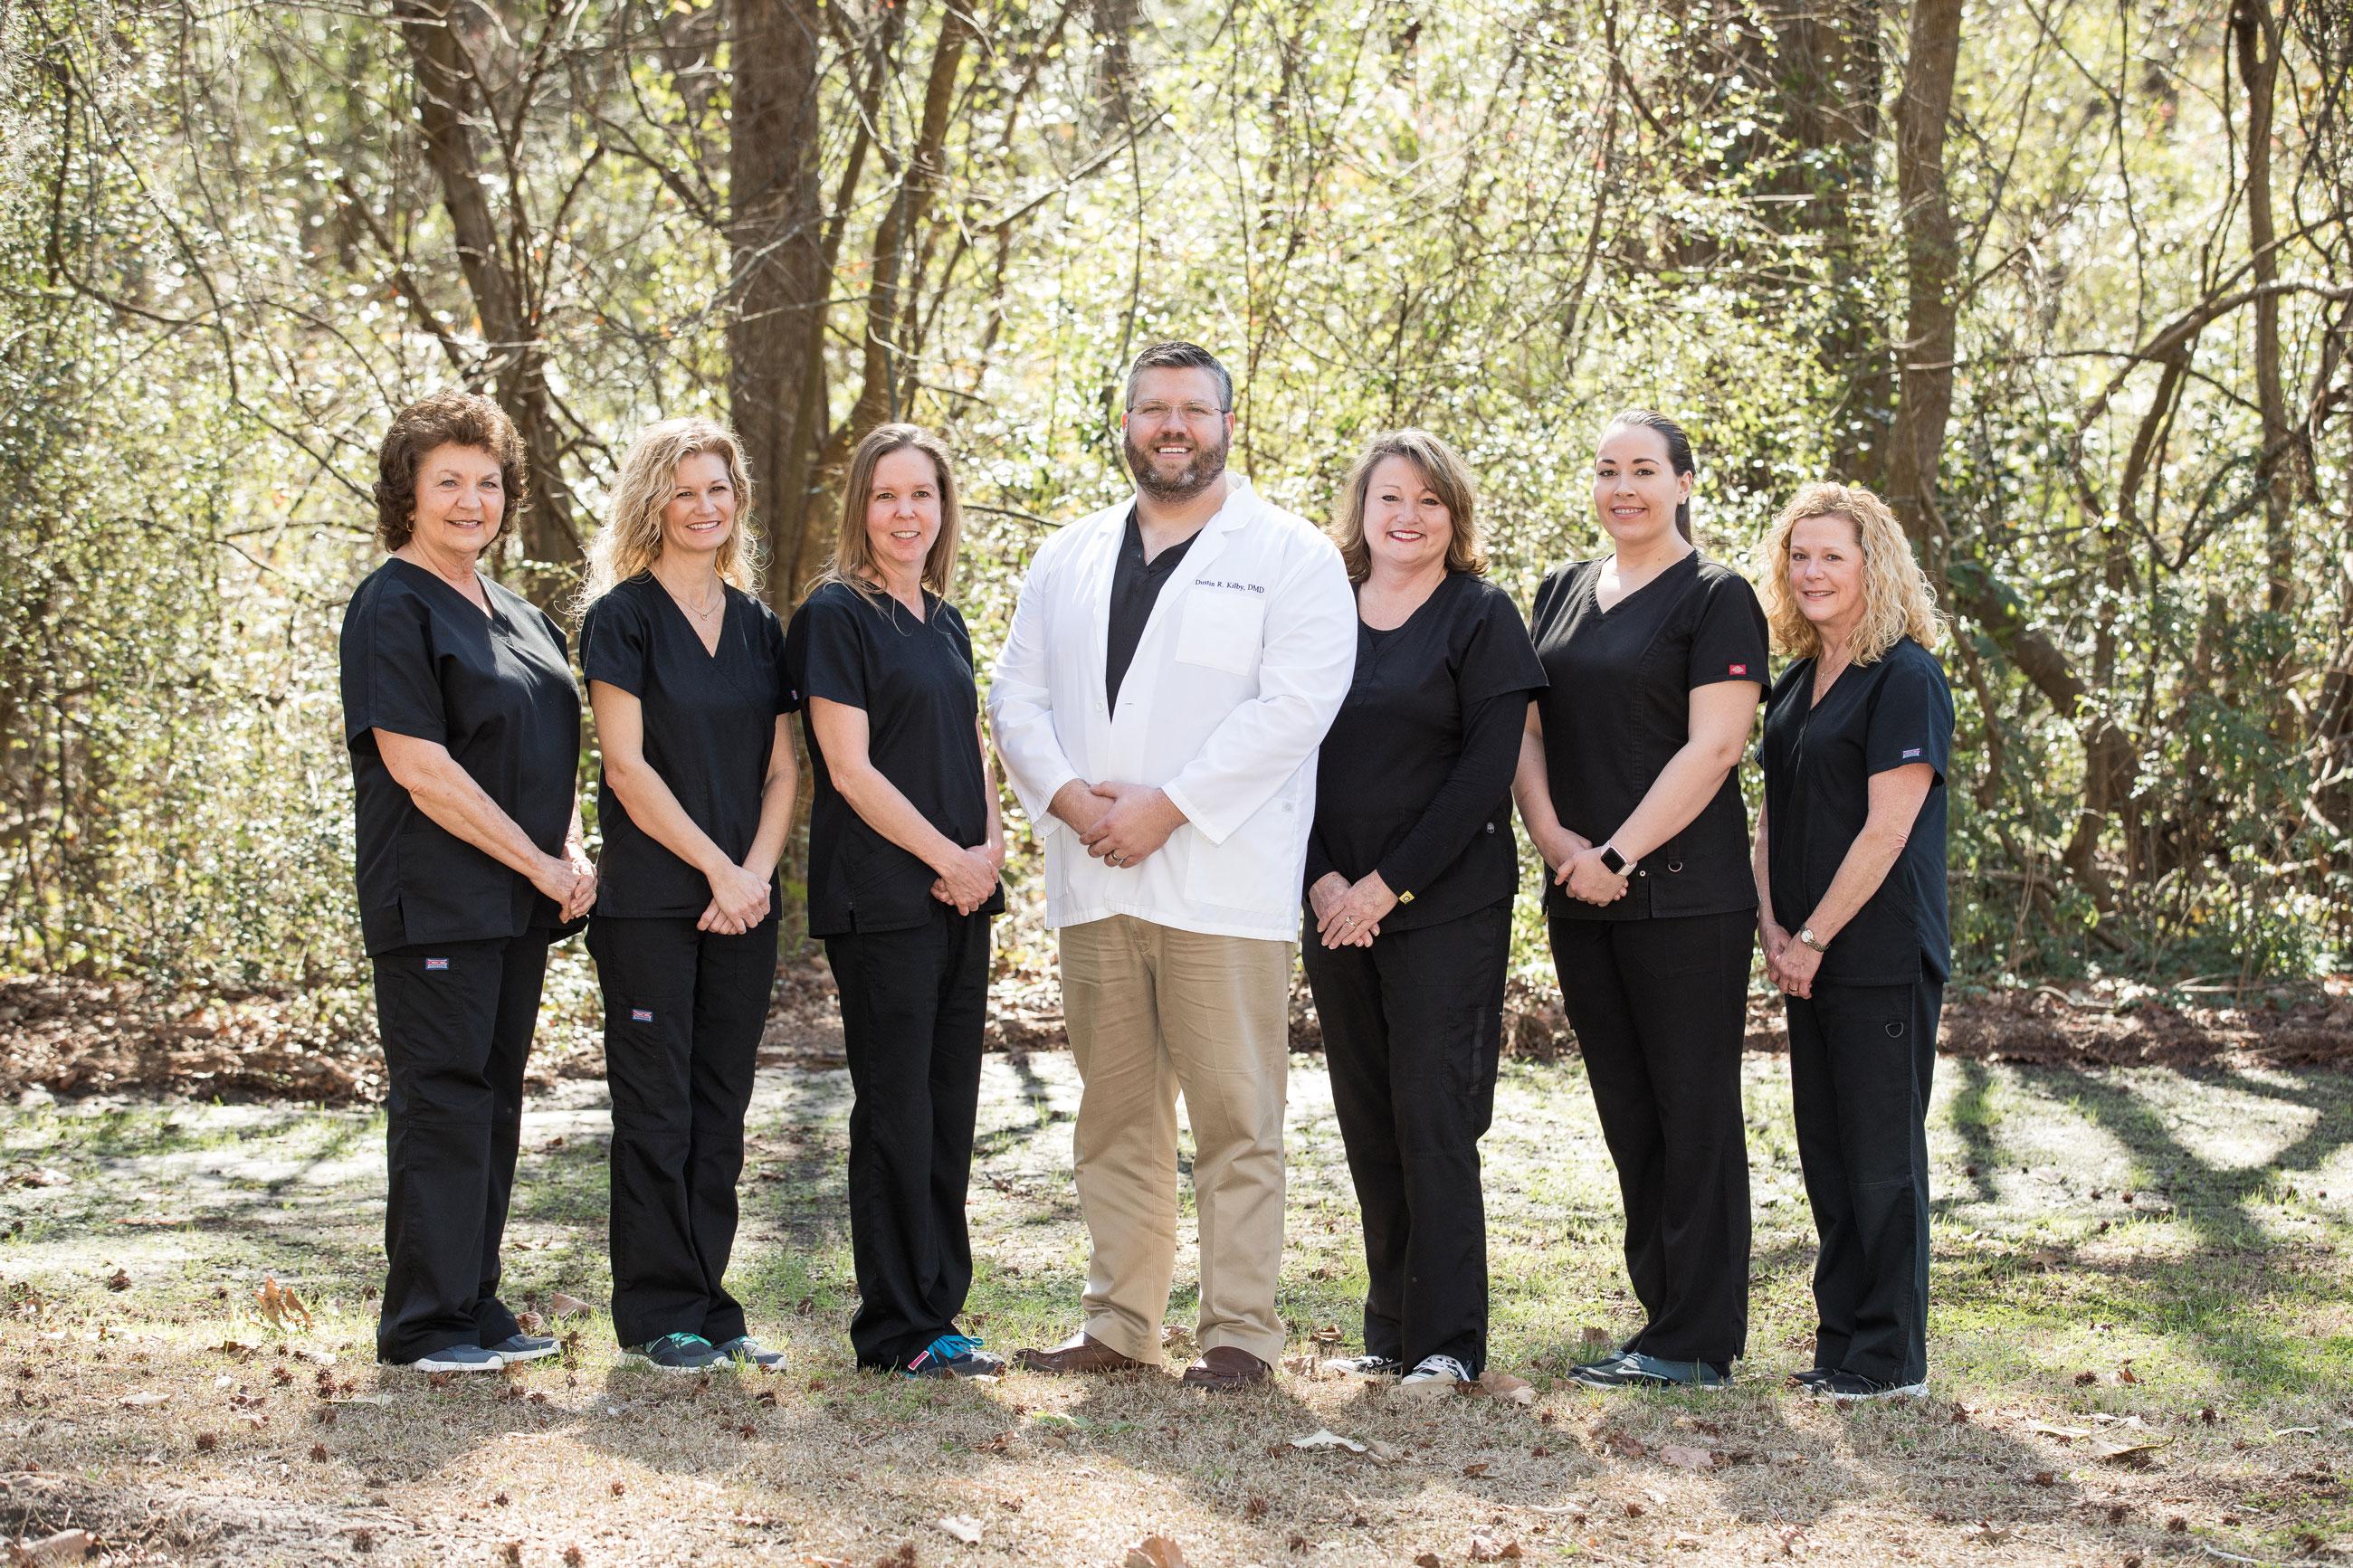 Dr. Kilby and Staff